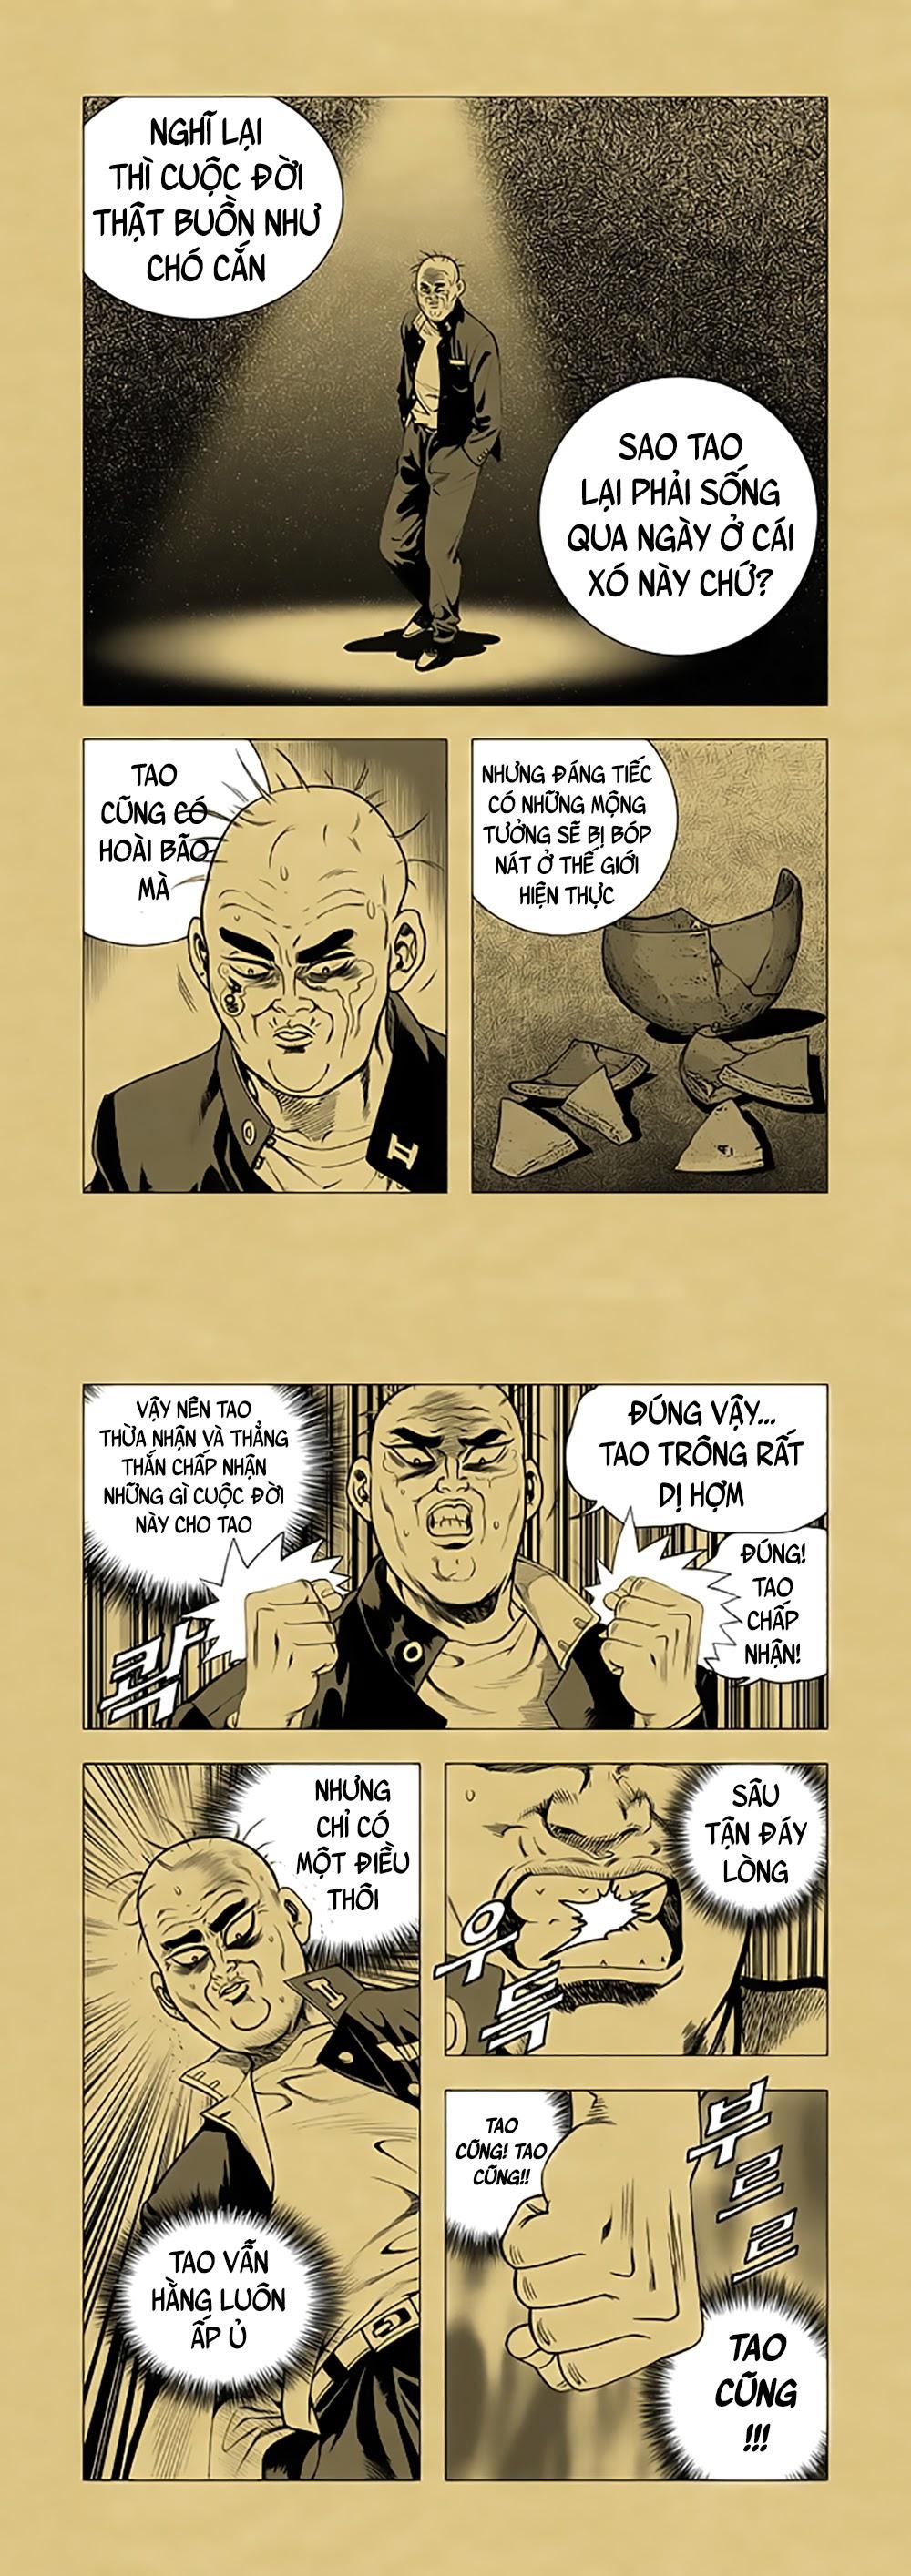 Lucky Ca Trở Lại - Lucky Jjang Returns 2012